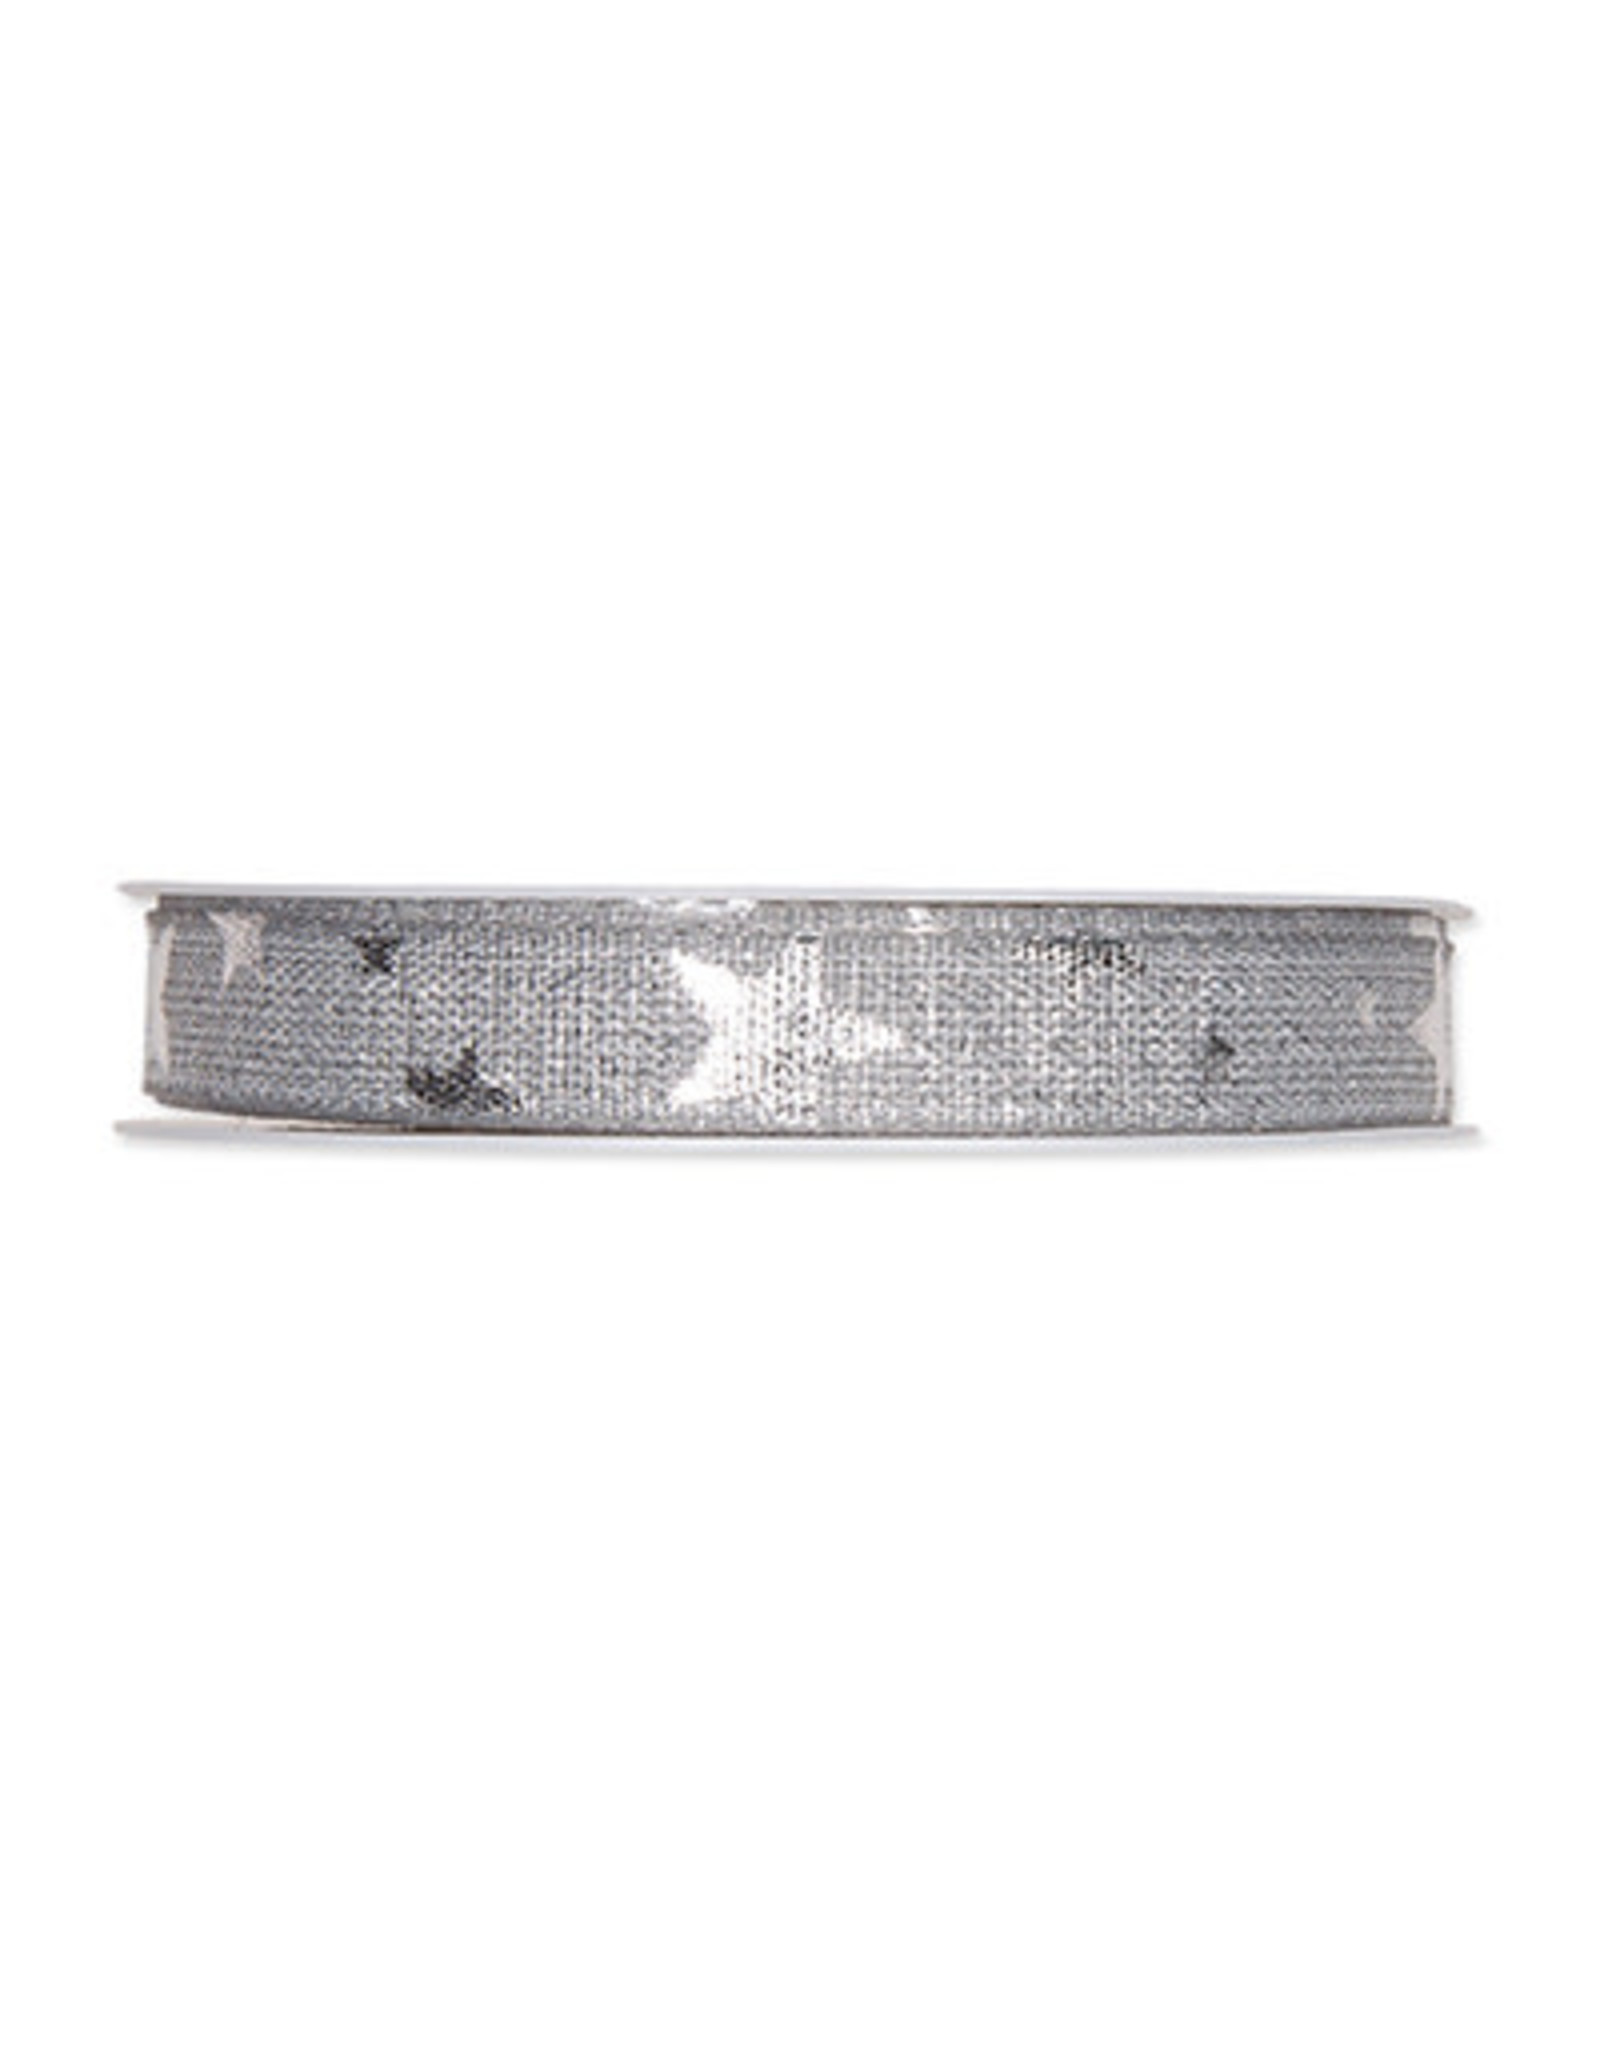 Halbach Halbach Printed Lurex Ribbon Stars Light Grey/Silver